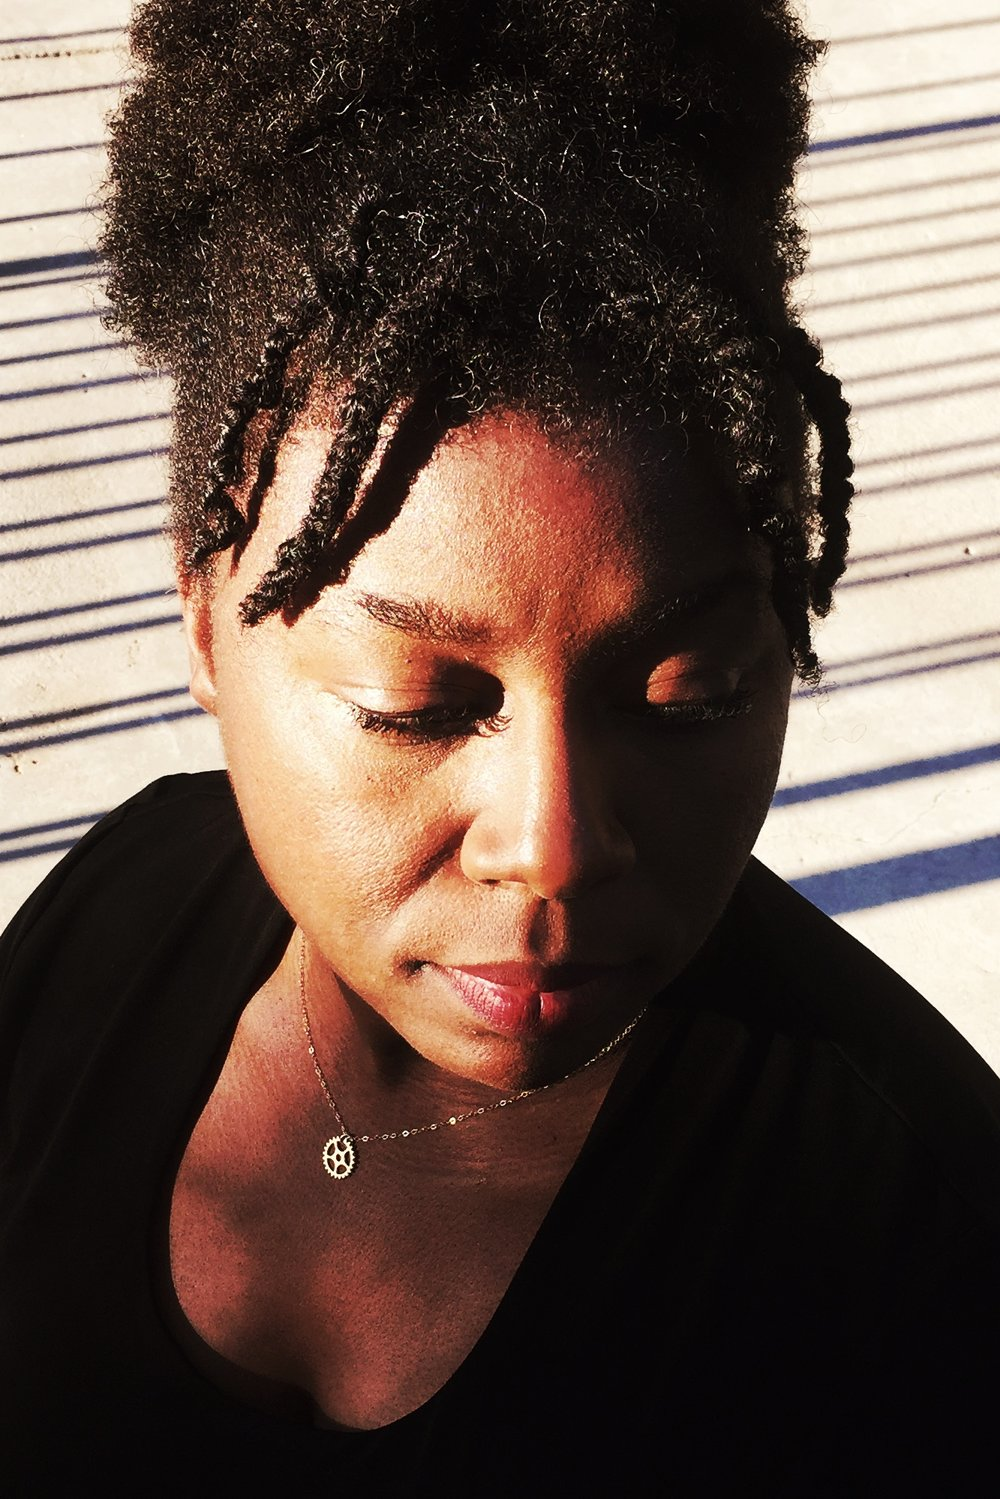 Sherri L Smith Author Photo - High Contrast.jpg